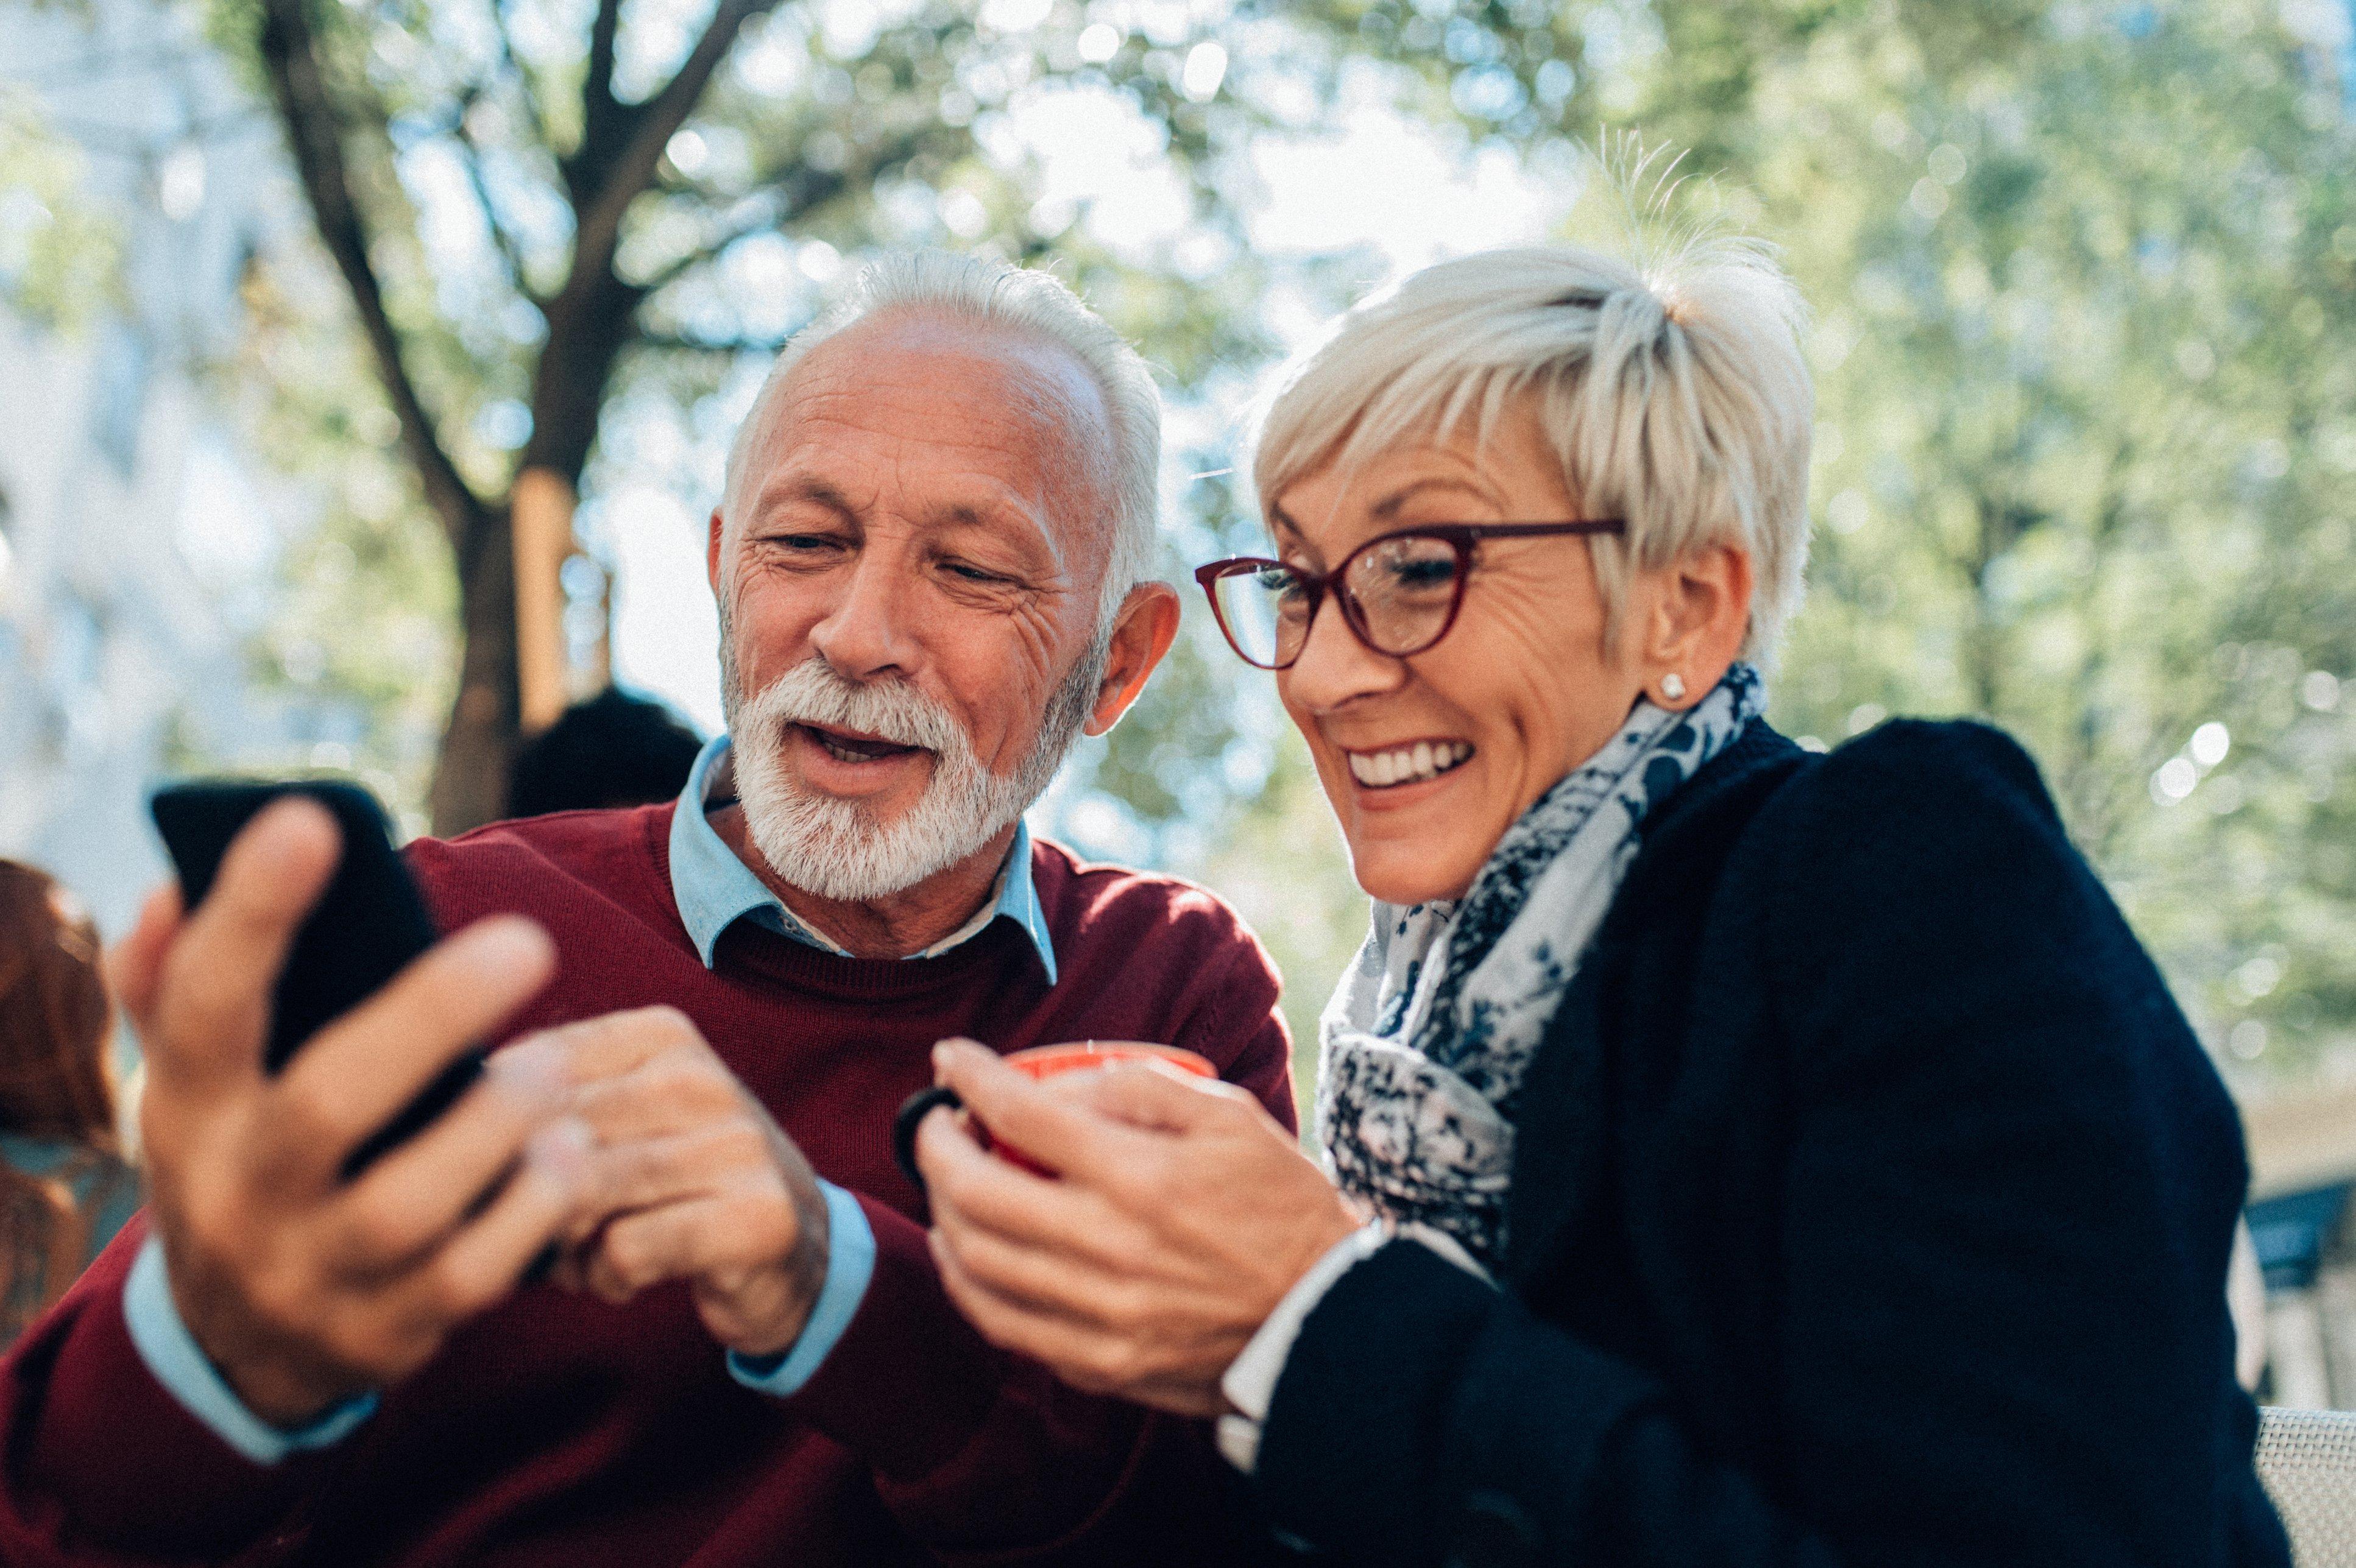 Mature Couple Using Smartphone